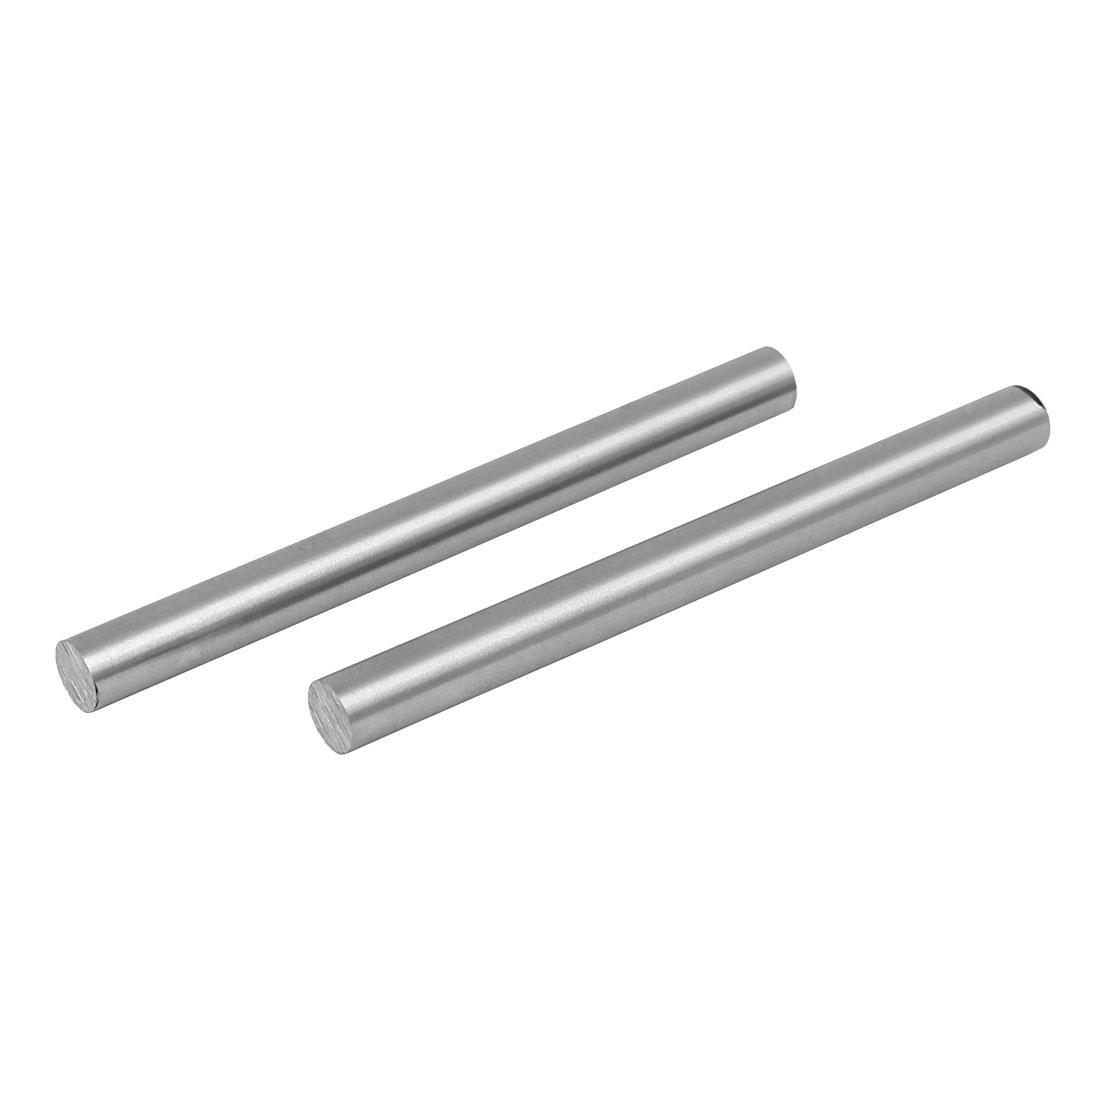 8.5mm Dia 100mm Length HSS Round Shaft Rod Bar Lathe Tools Gray 2pcs